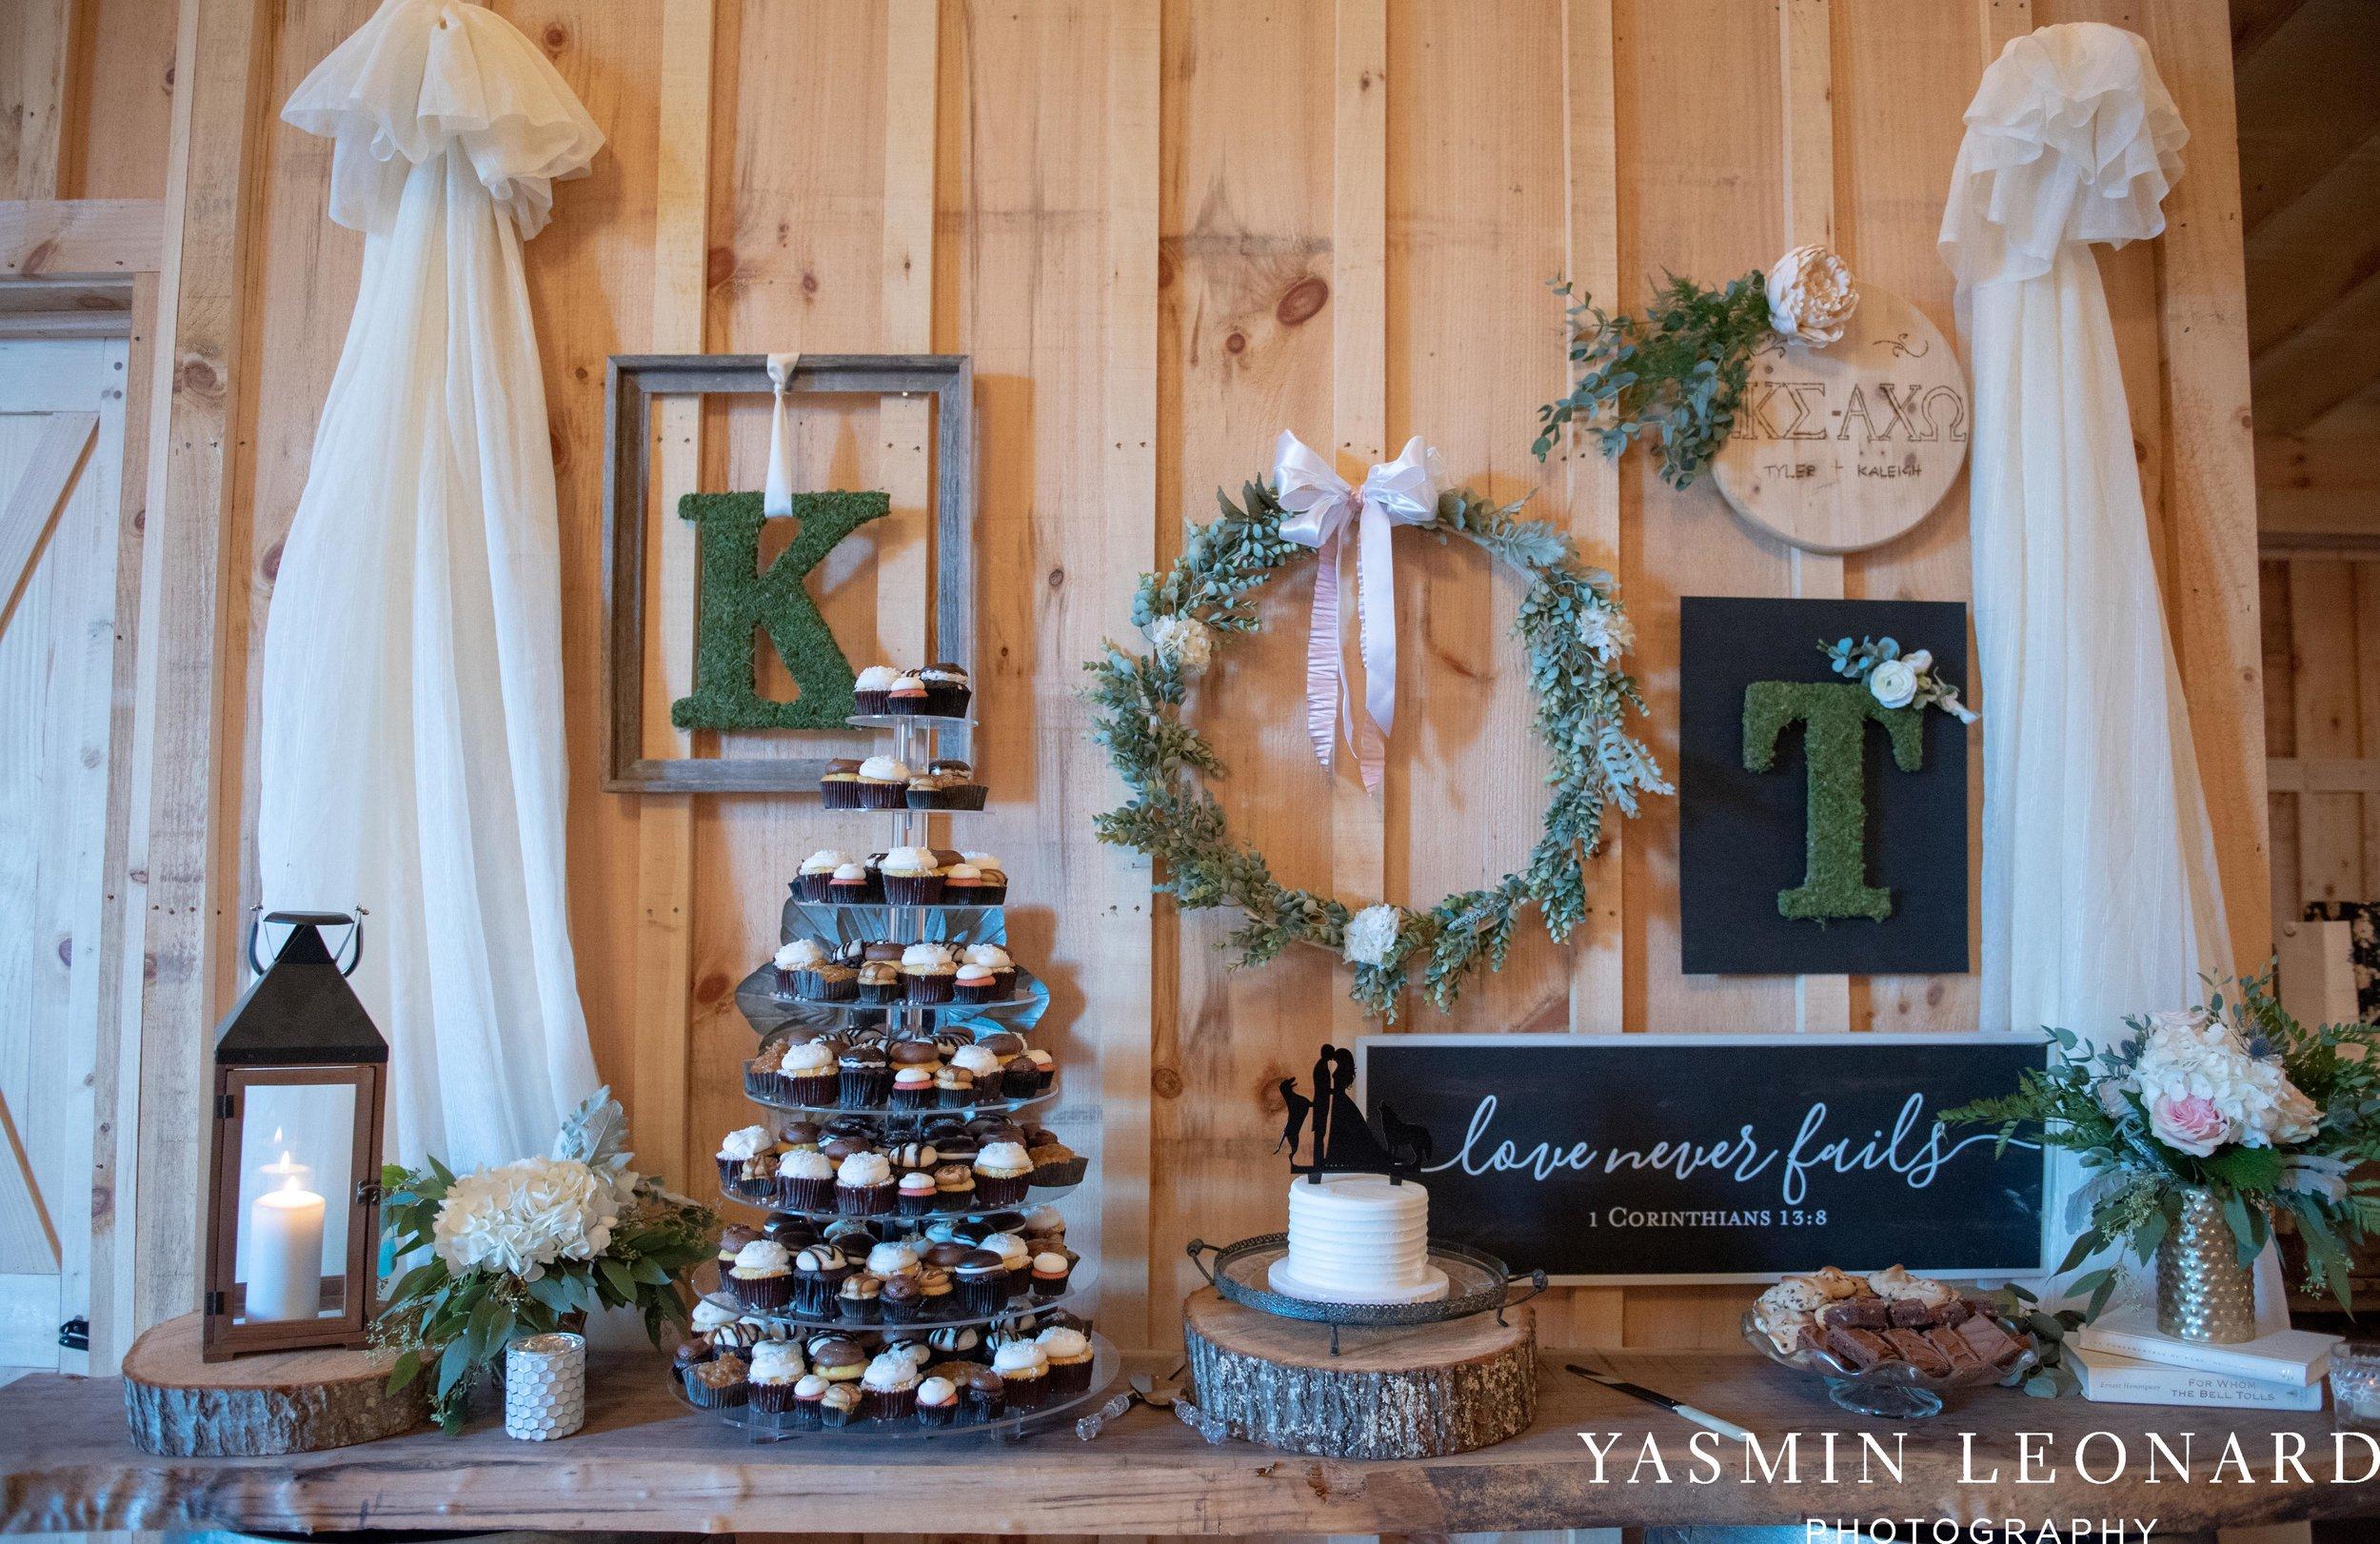 Wesley Memorial United Methodist Church - Old Homeplace Winery - High Point Weddings - High Point Wedding Photographer - NC Weddings - NC Barn Venue - Yasmin Leonard Photography-48.jpg